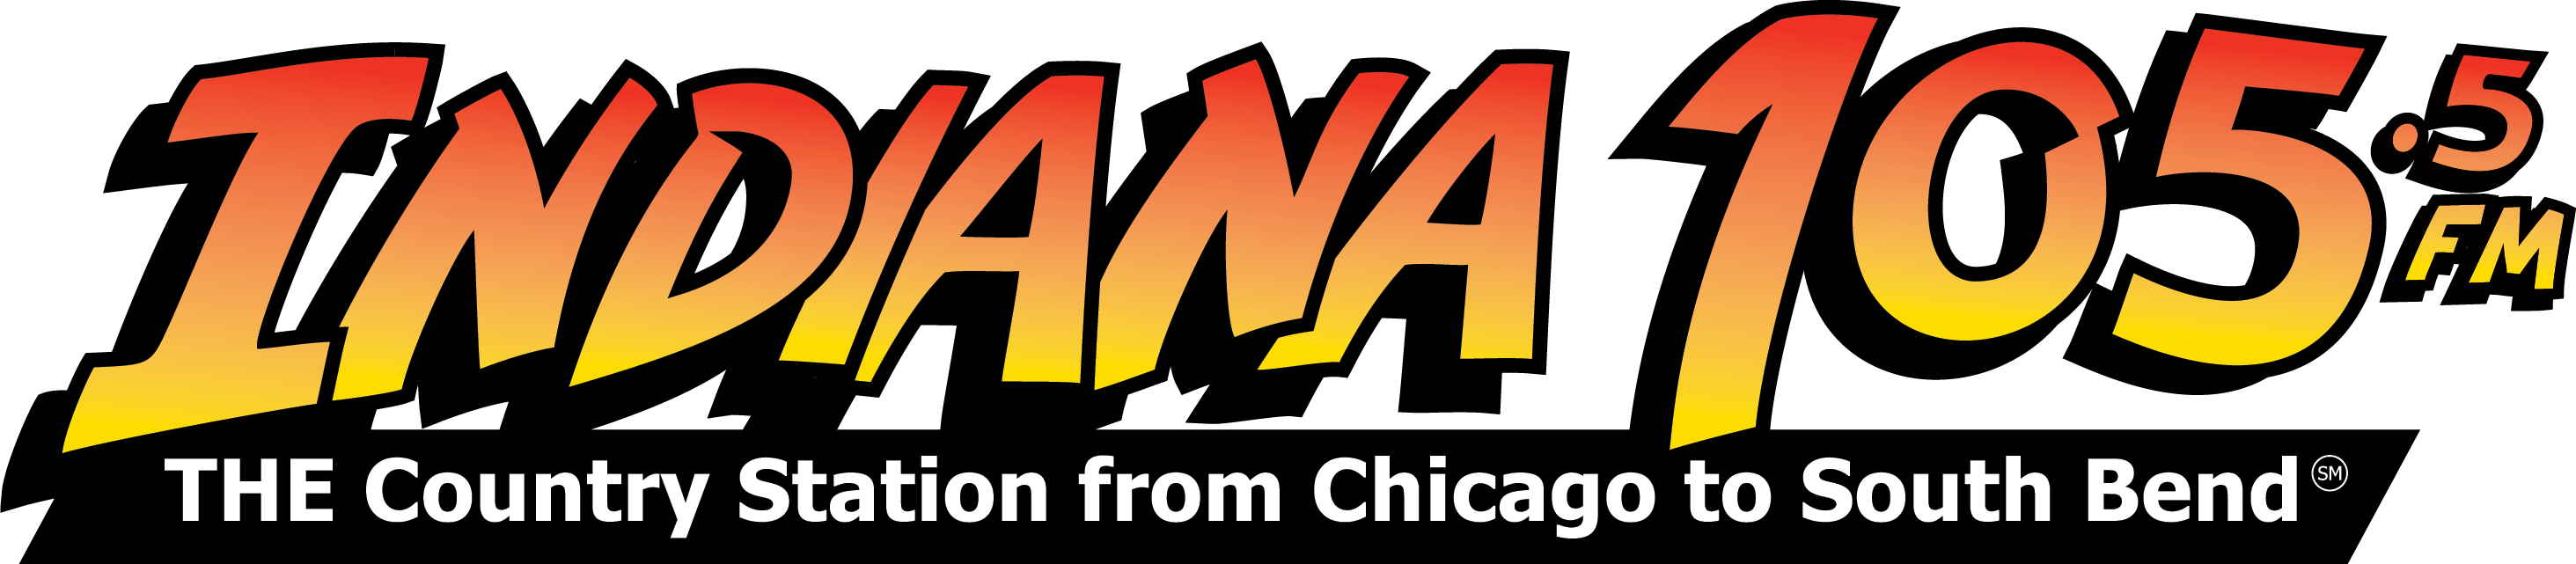 Indiana 105.5 FM